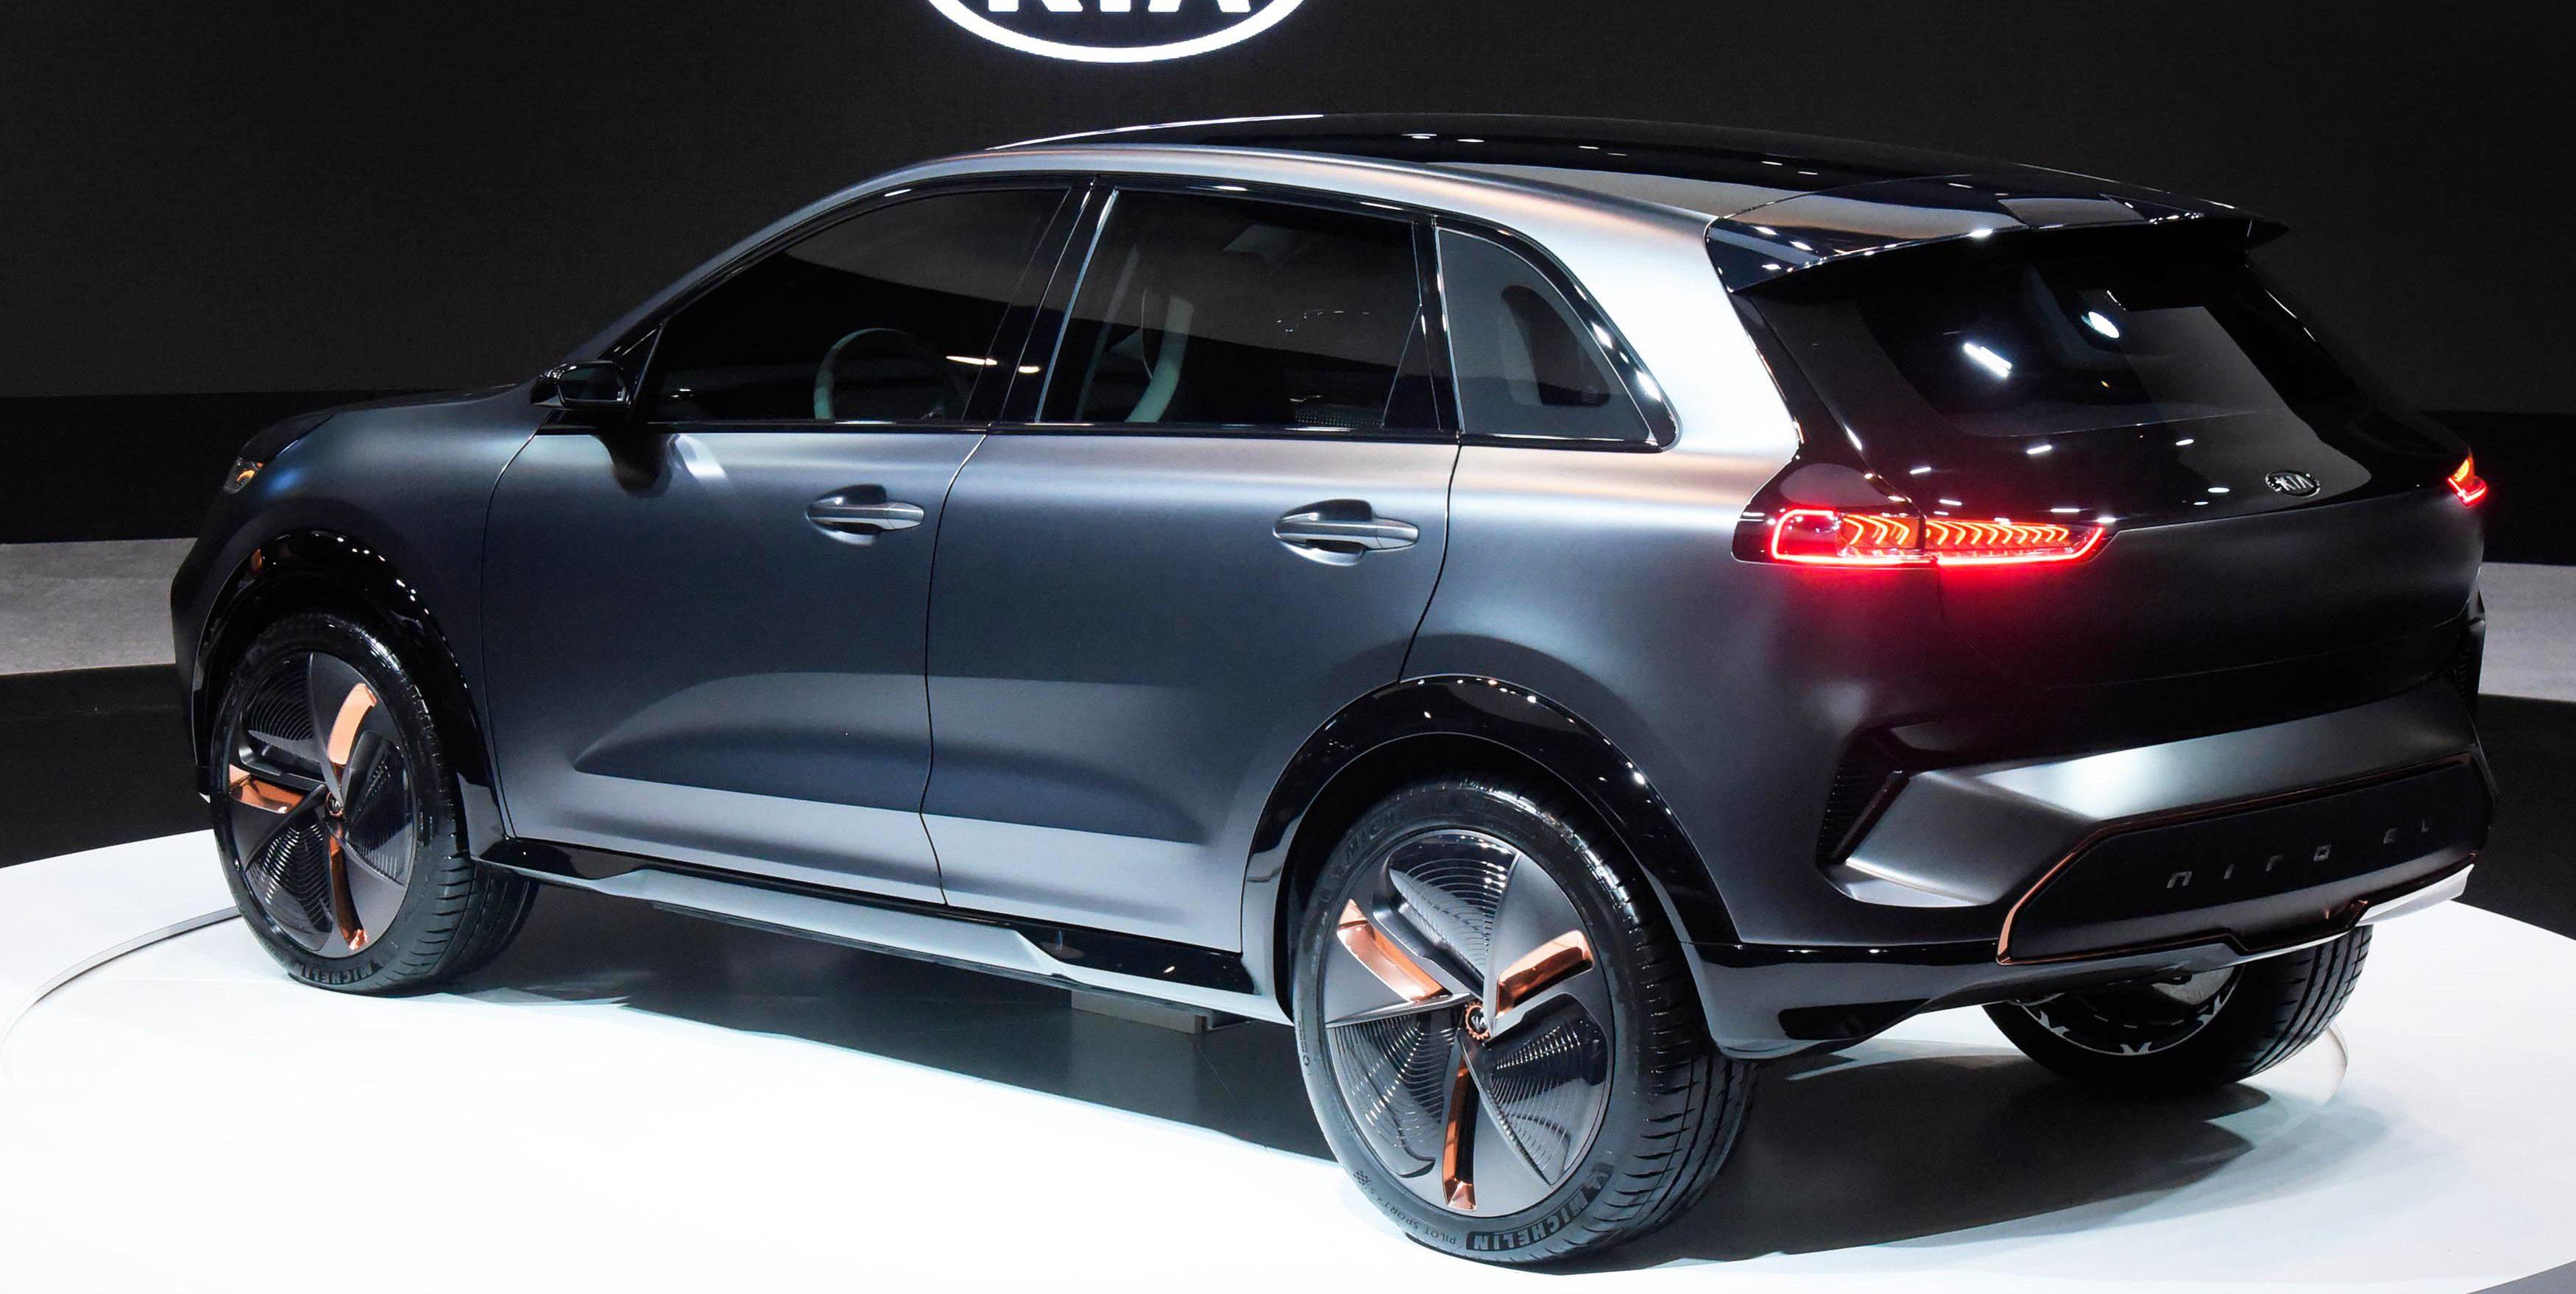 Kia Electric Car >> Kia unveils new all-electric compact SUV concept ahead of Niro EV launch - Electrek